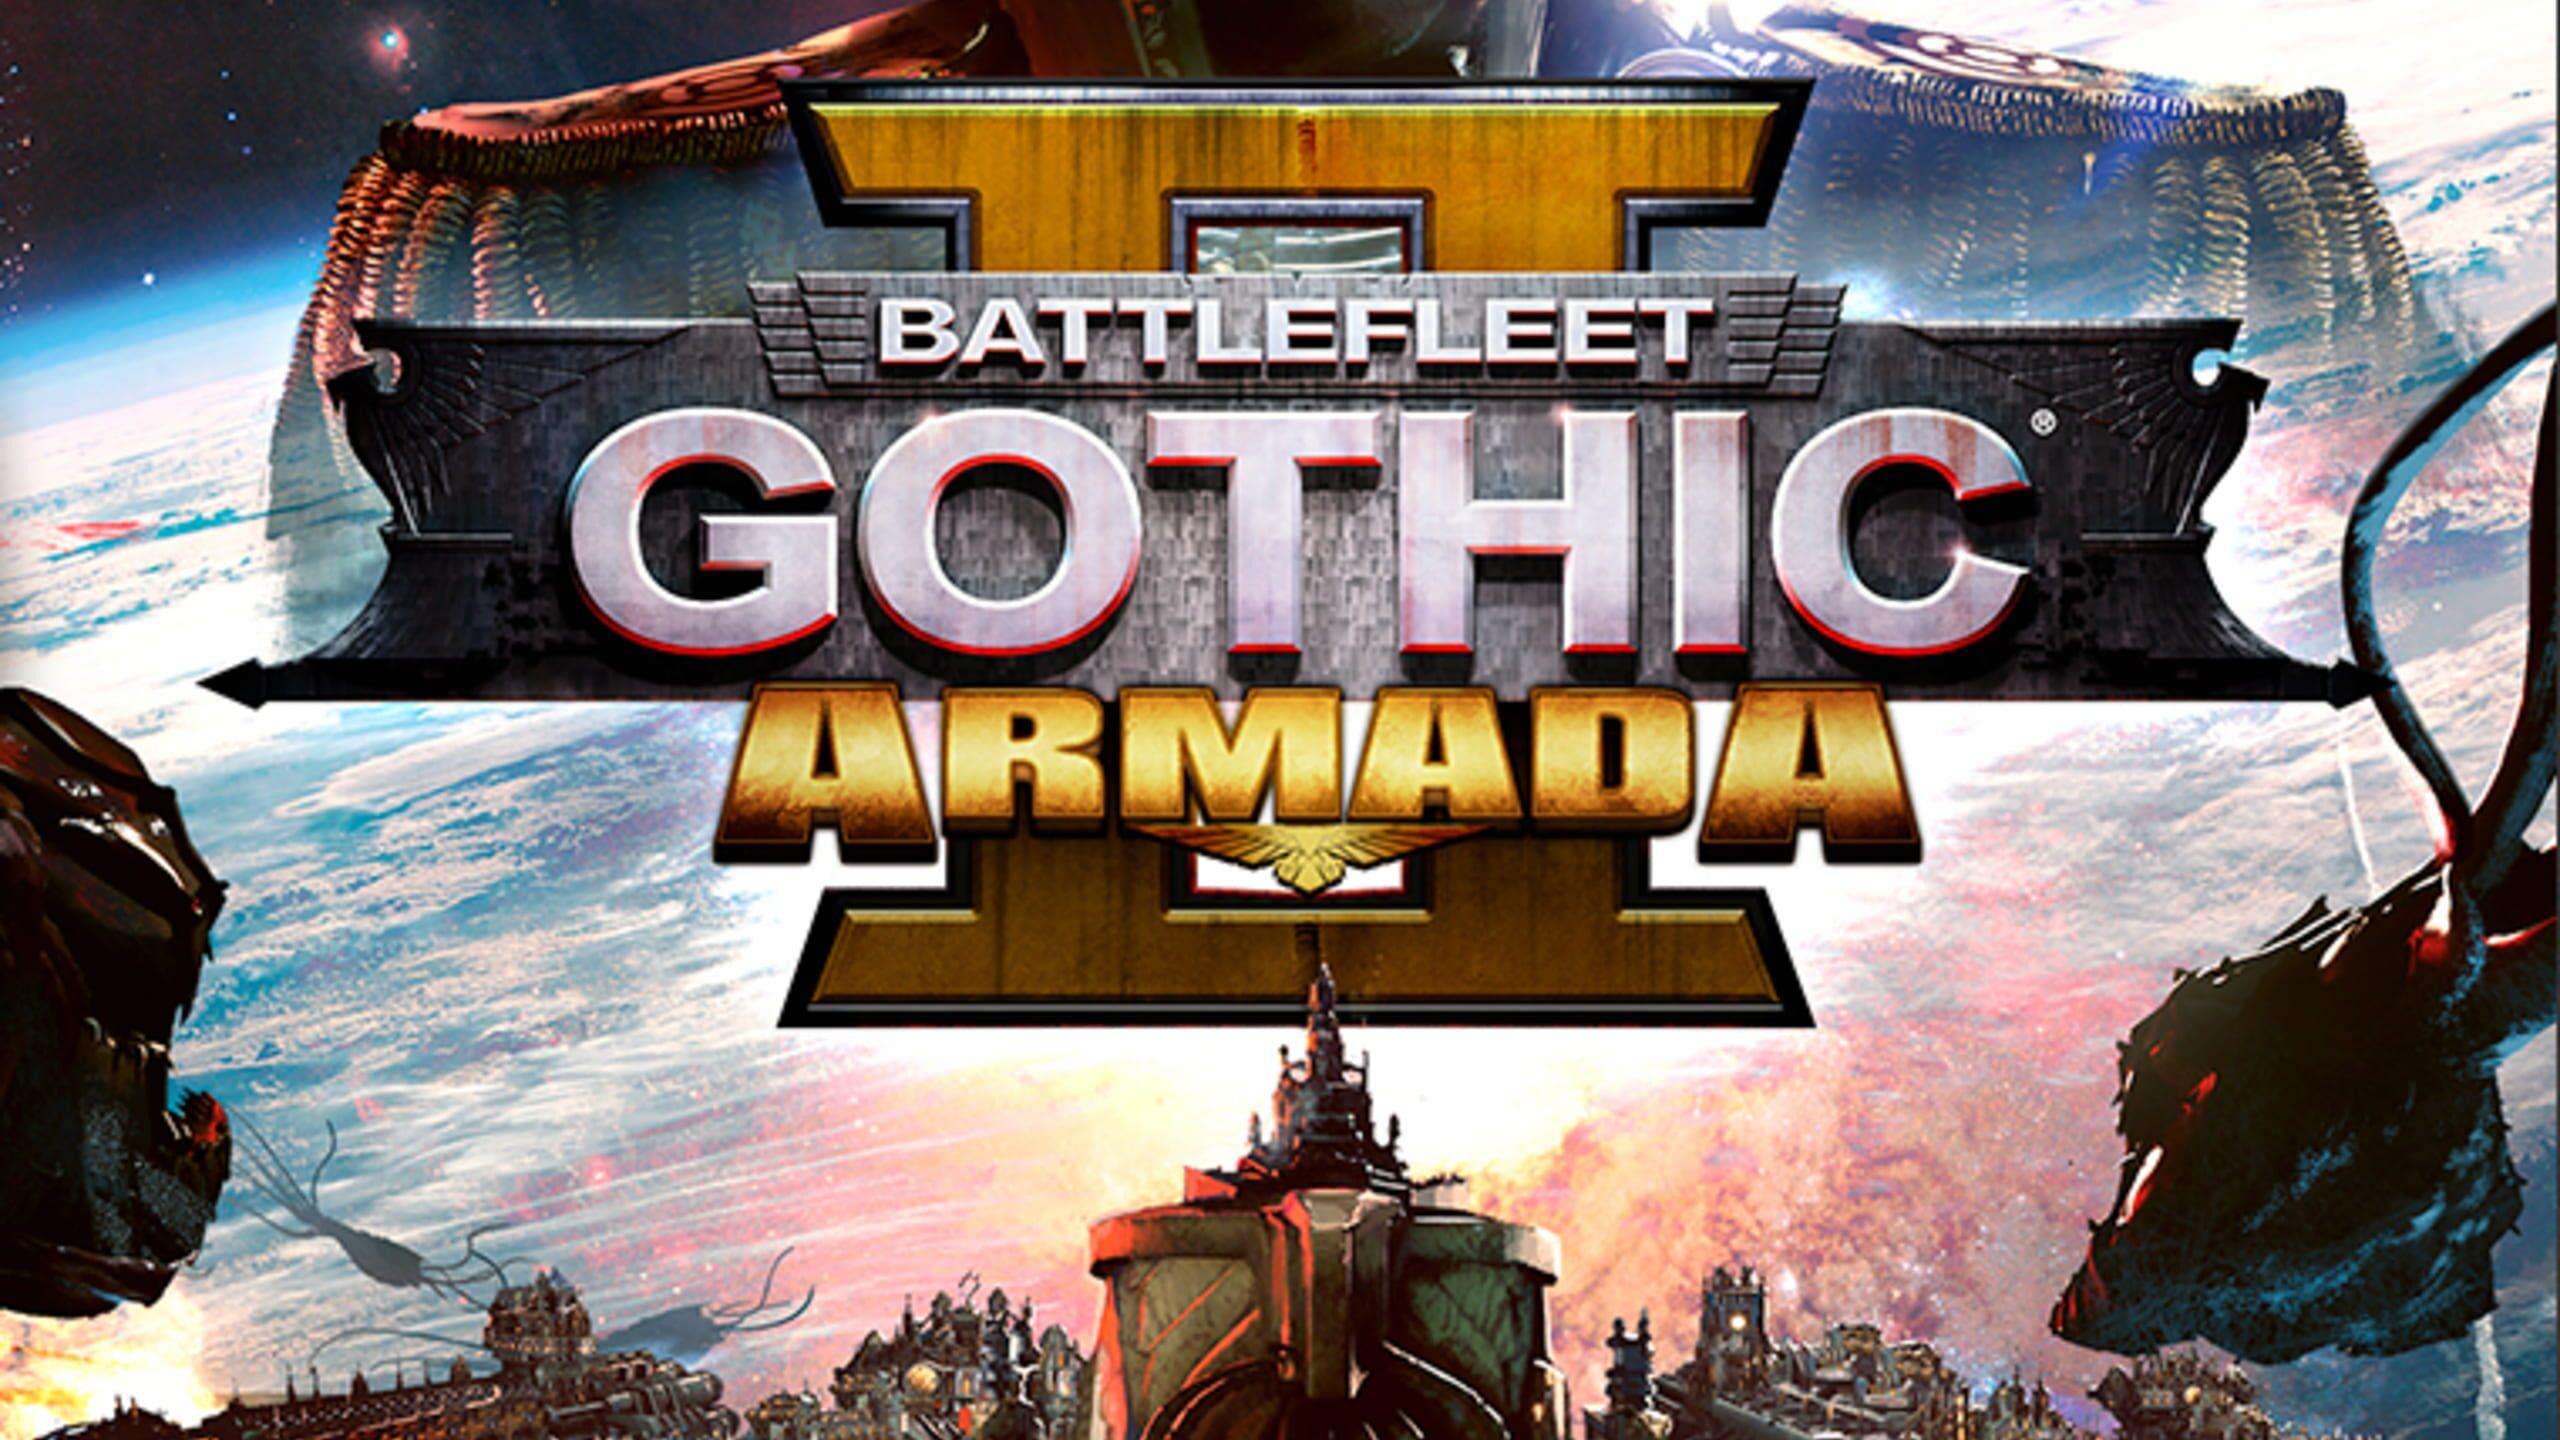 game cover art for Battlefleet Gothic: Armada 2